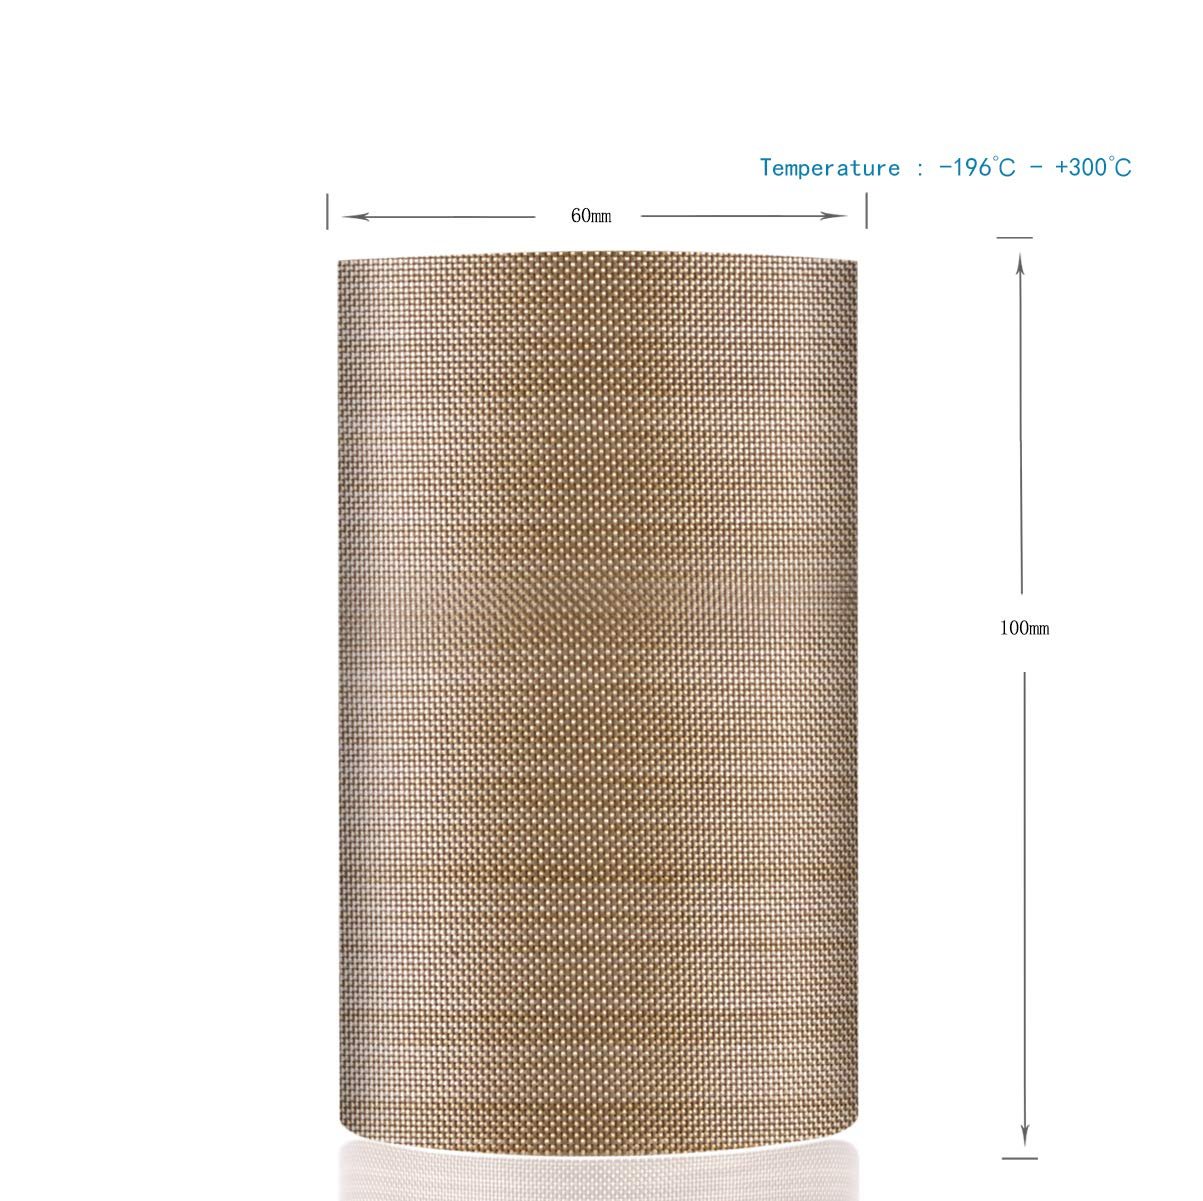 196℃ 48mm x 12yards x 0.18mm, Brown 2 PTFE Coated Fiberglass Teflon Tape Welding Sealing Tape +300℃